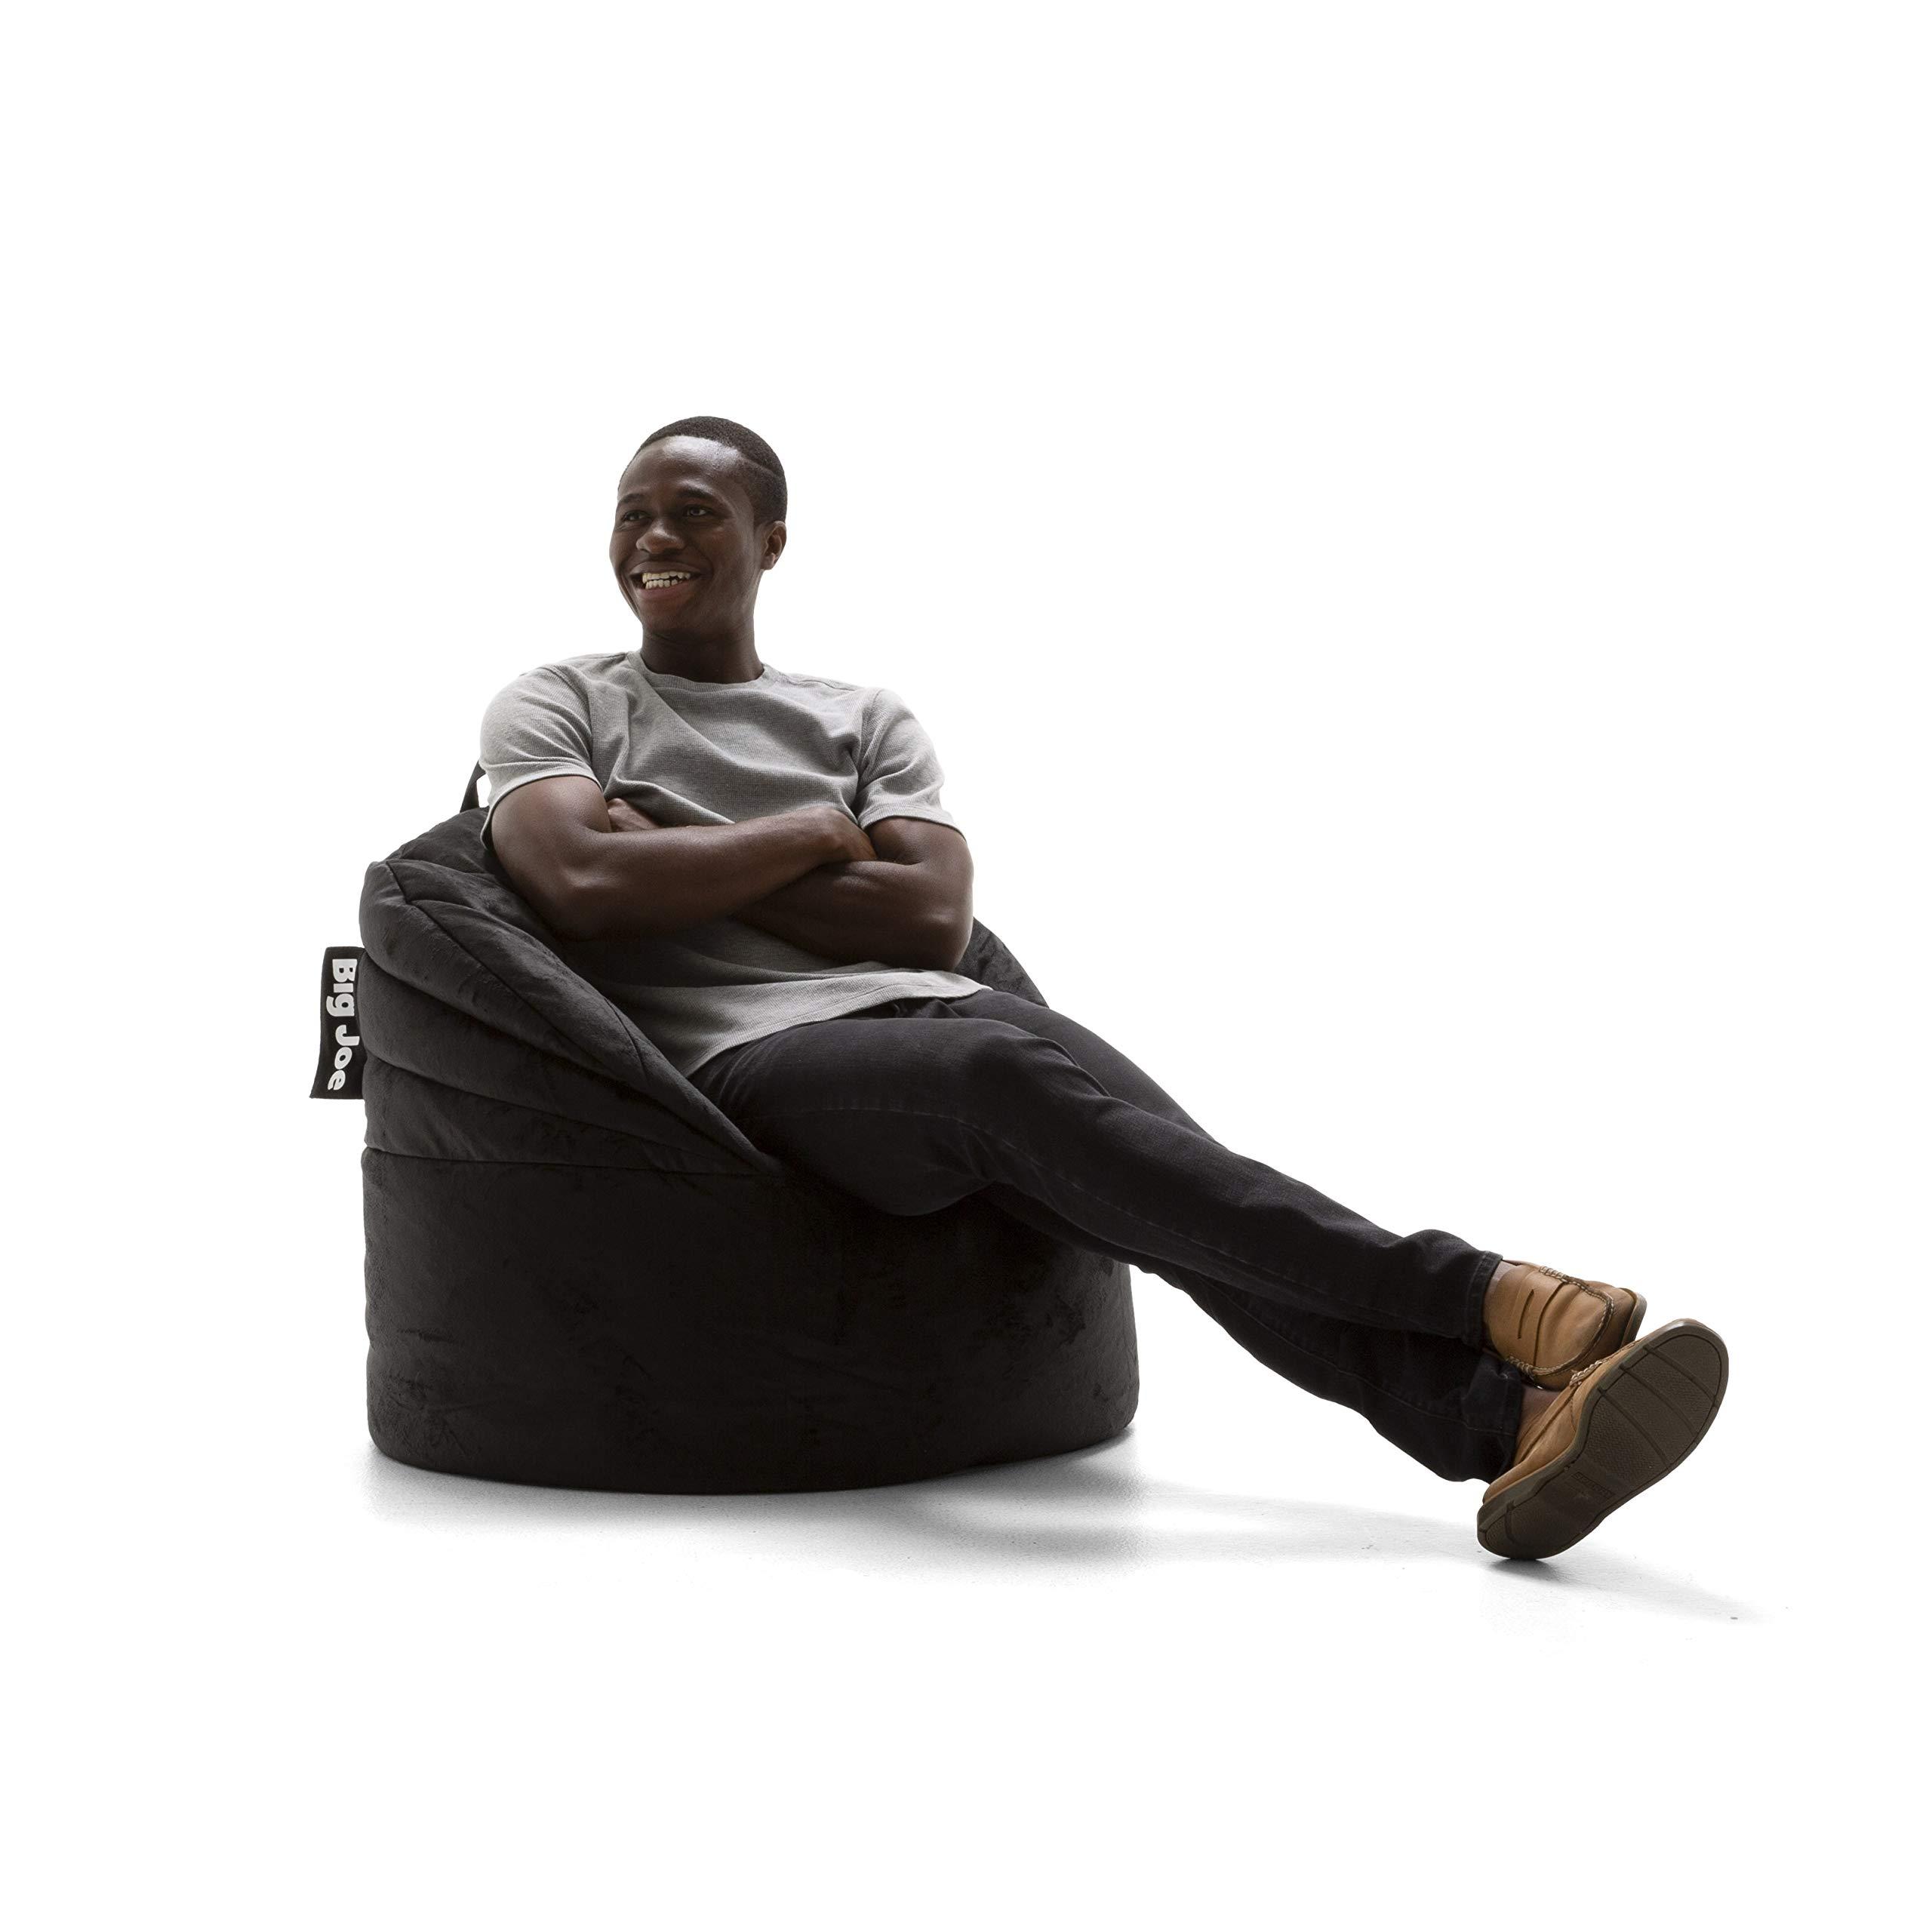 Big Joe 0680540 Stack Chair, Black Plush Bean Bag, by Big Joe